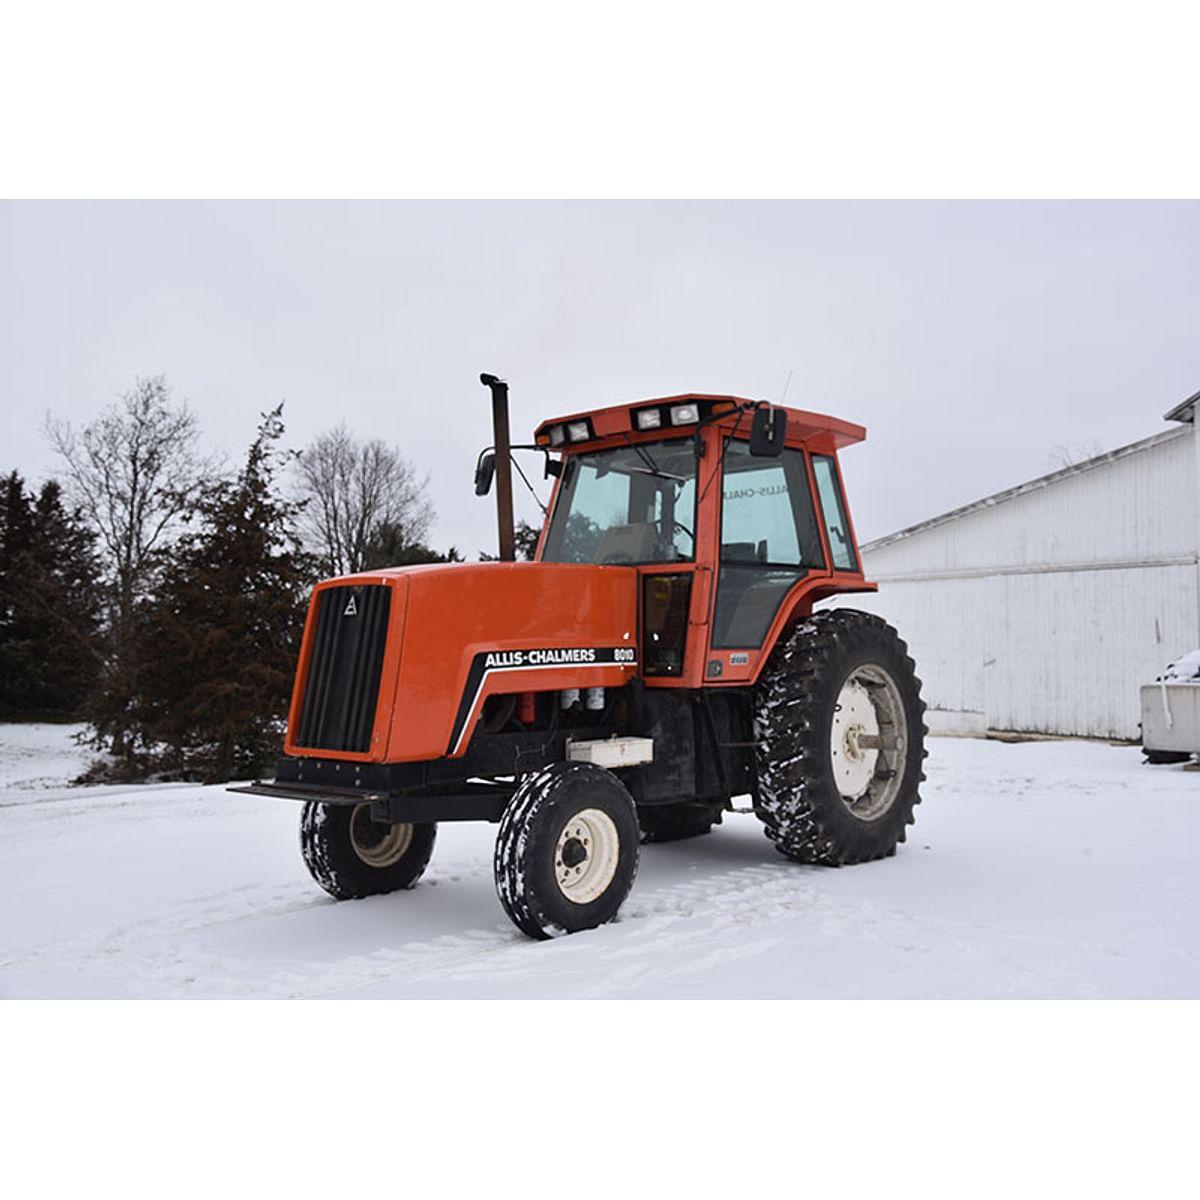 Bauer Farm Equipment Auction | The Wendt Group, Inc  | Land